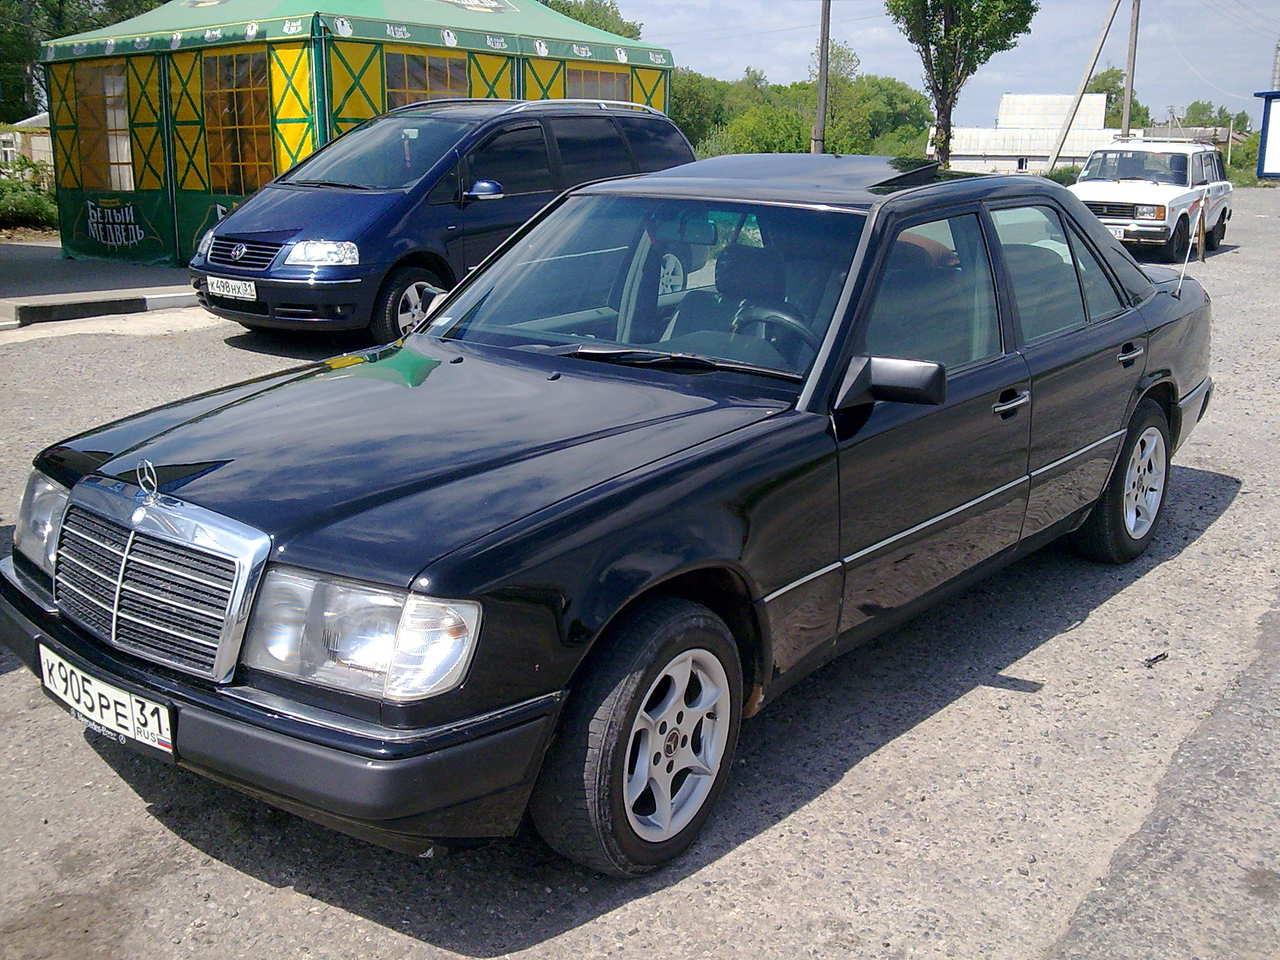 1992 mercedes benz c class photos 3 0 diesel fr or rr for Mercedes benz 1992